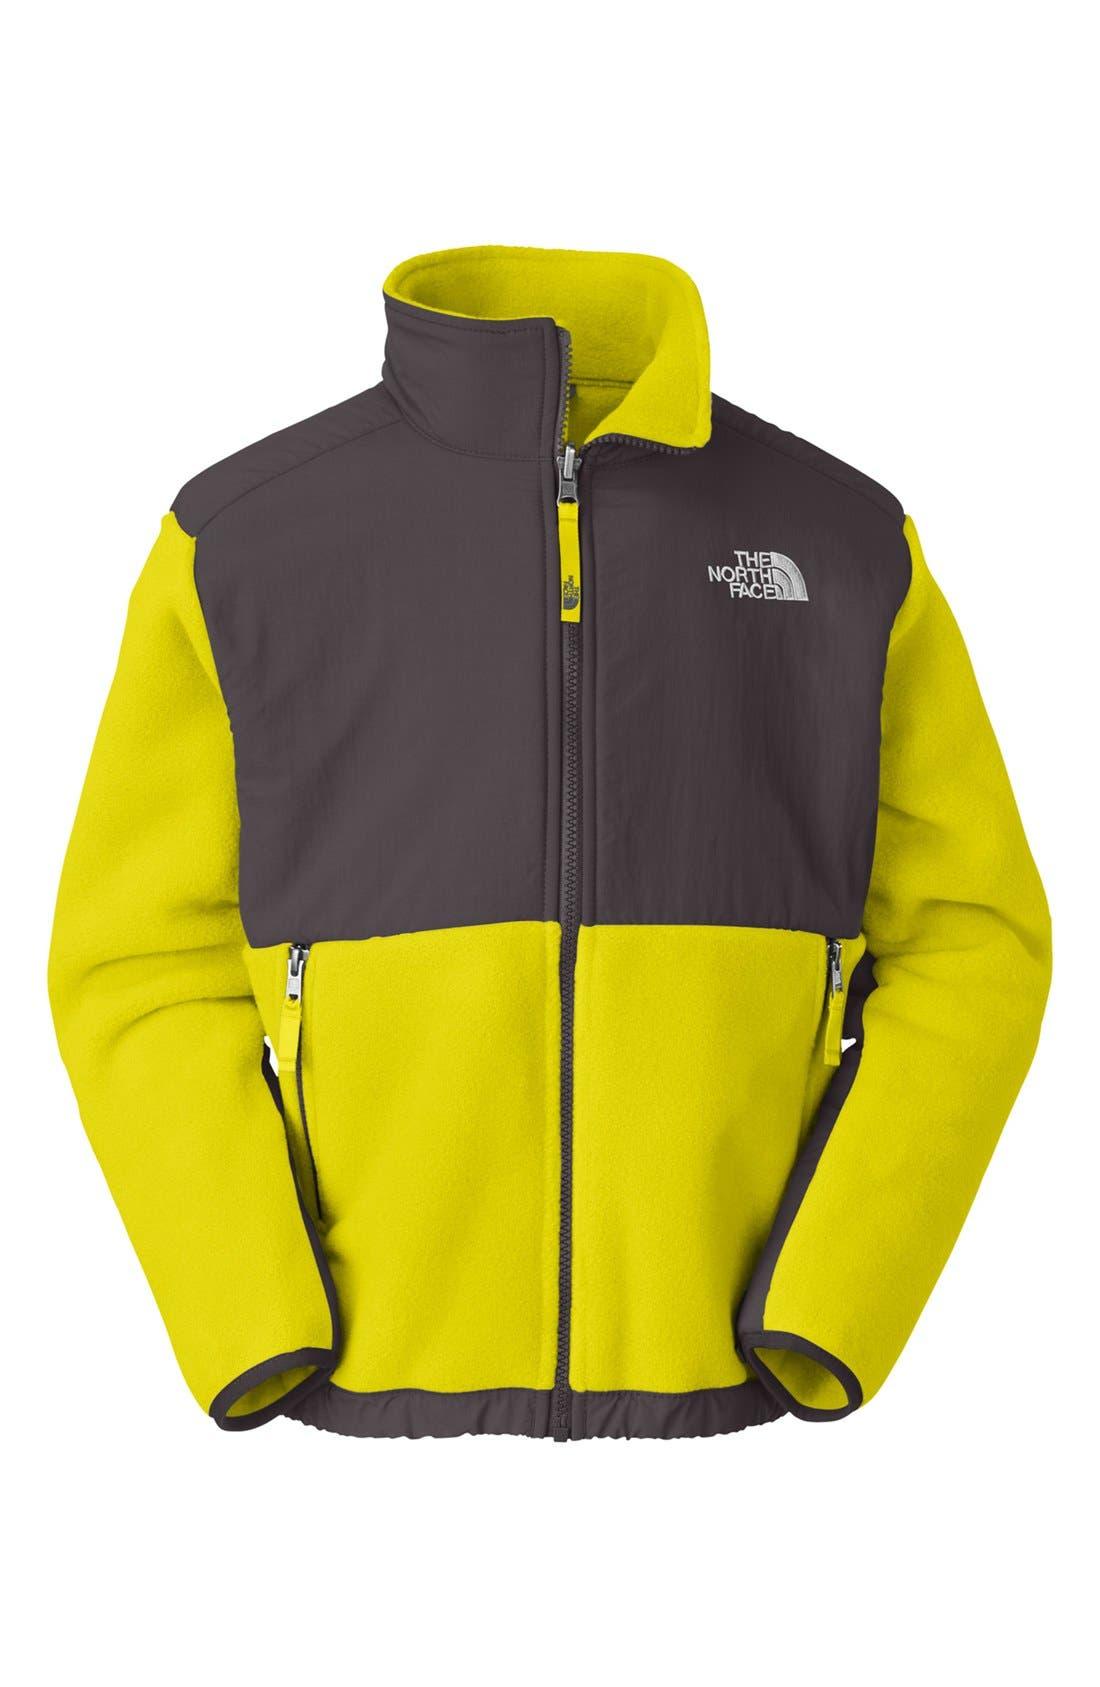 Main Image - The North Face 'Denali' Fleece Jacket (Little Boys)